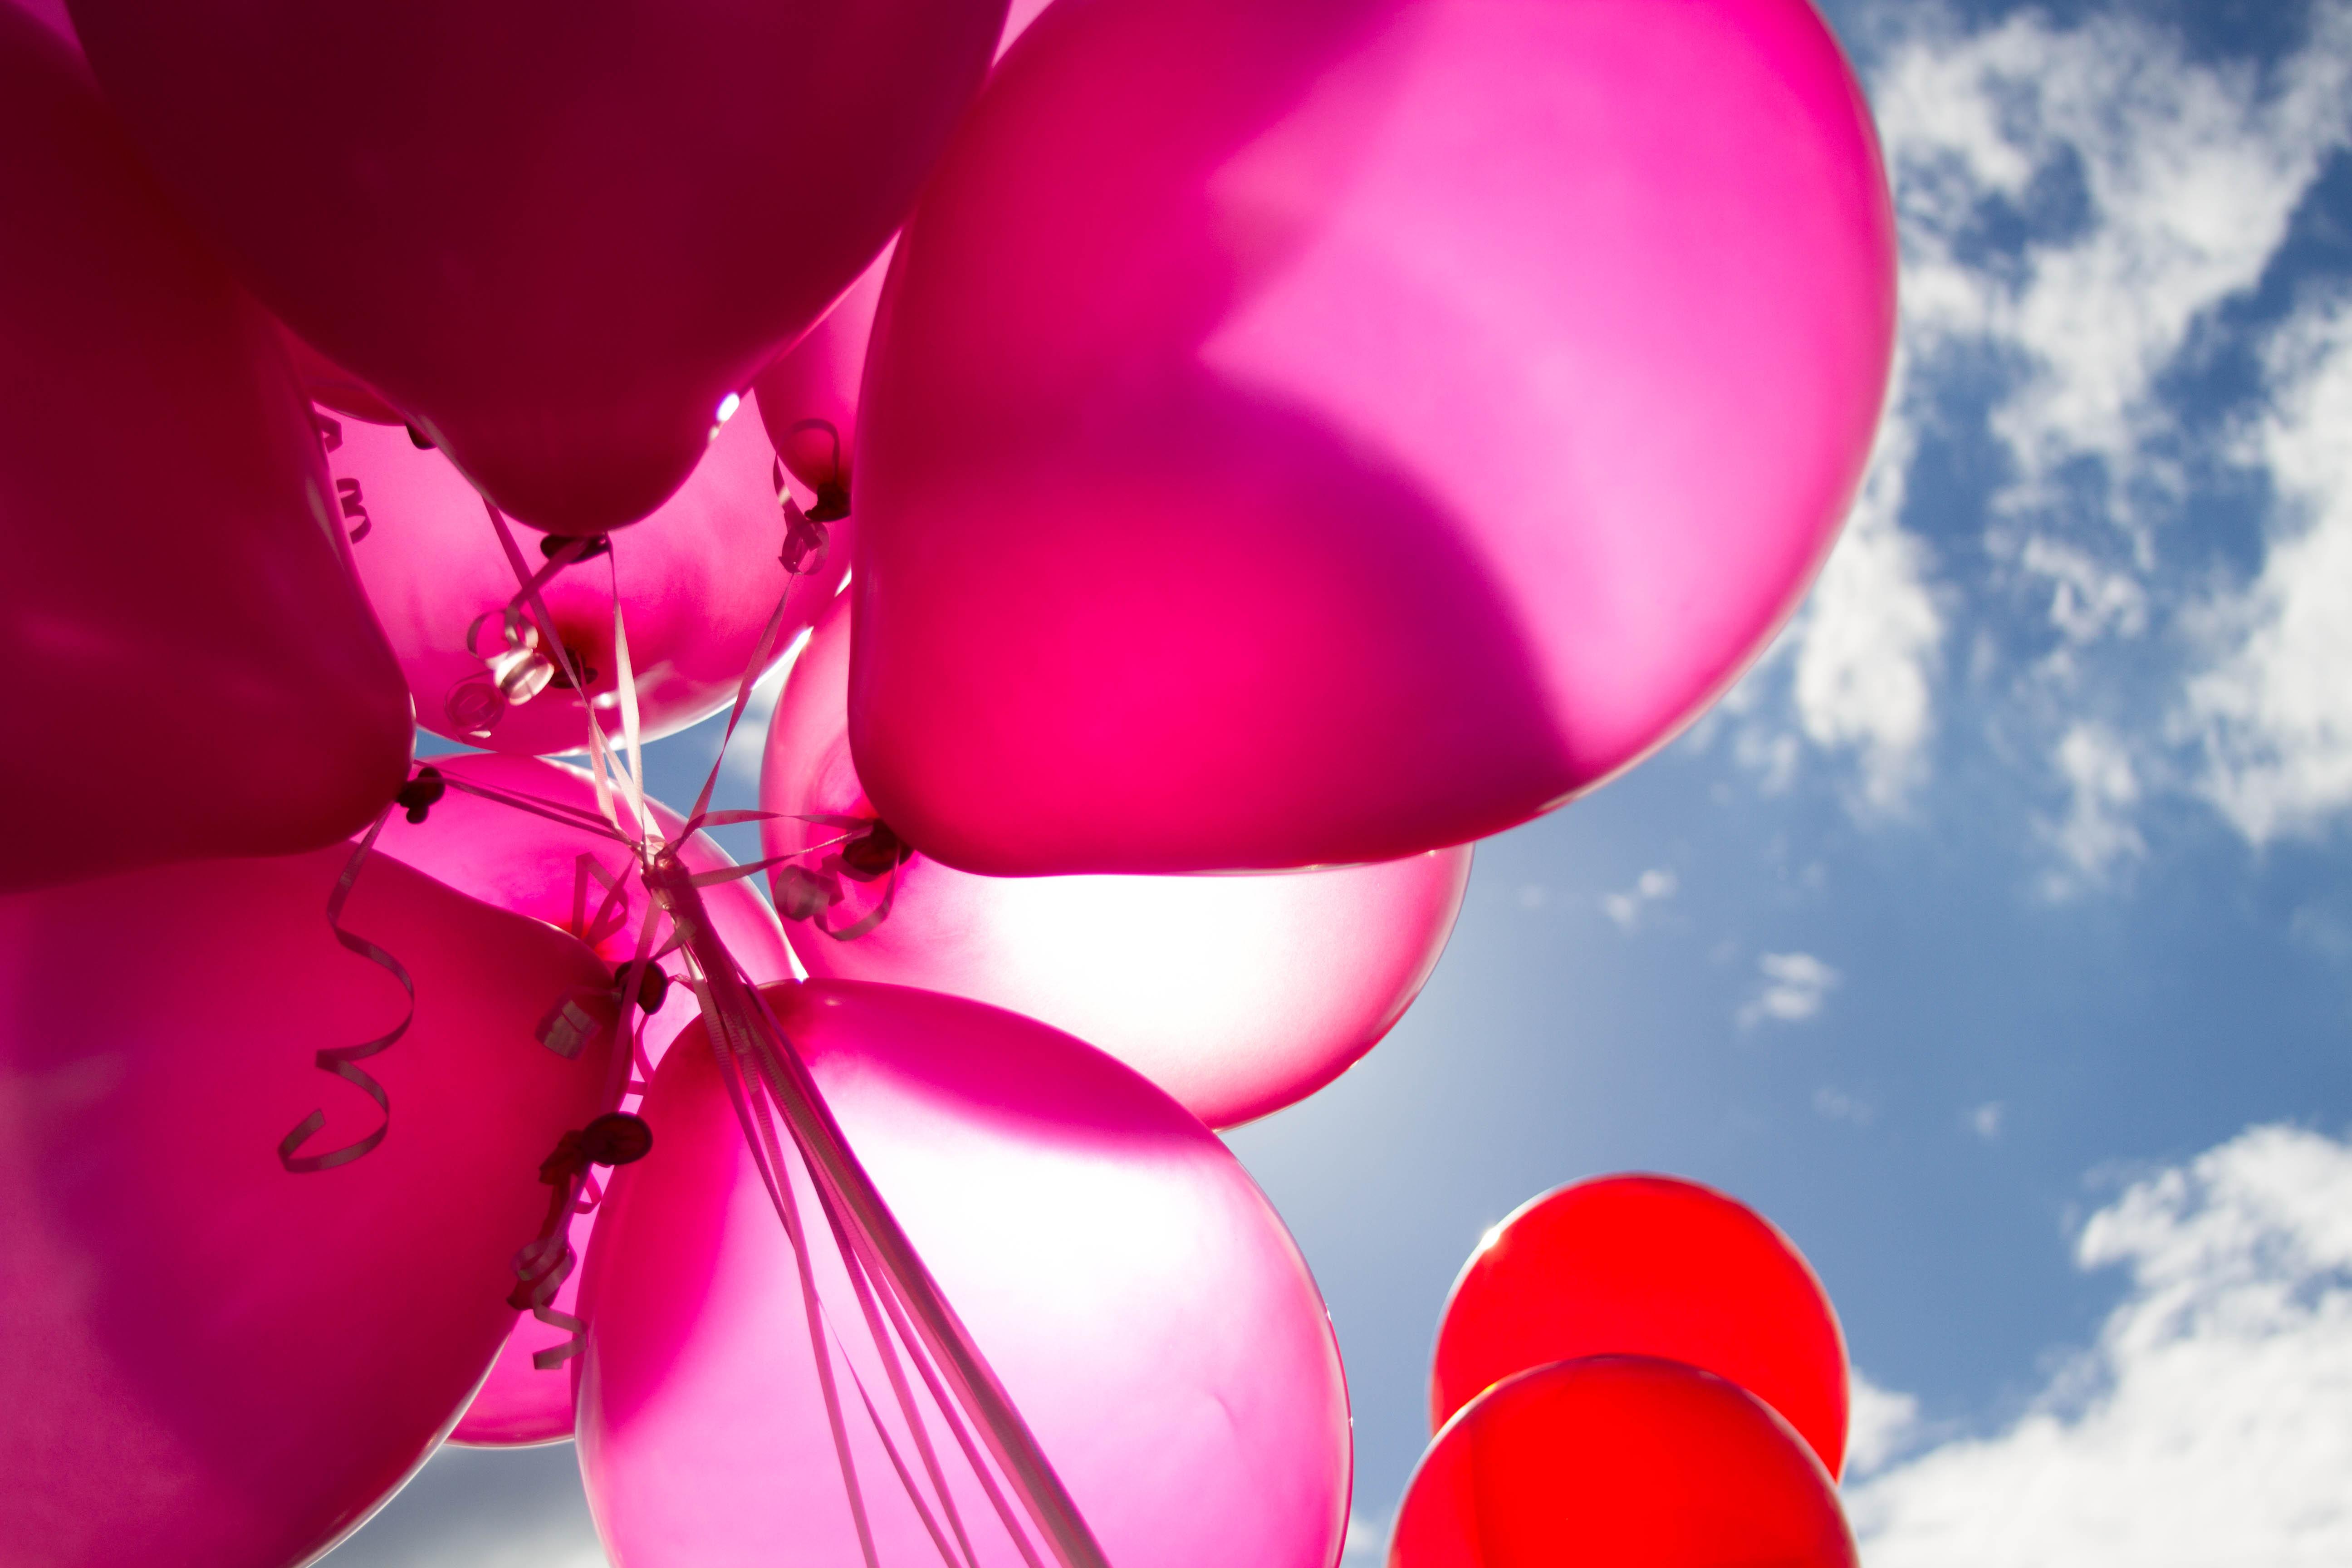 10 Cute Health And Safety Fair Ideas %name 2021